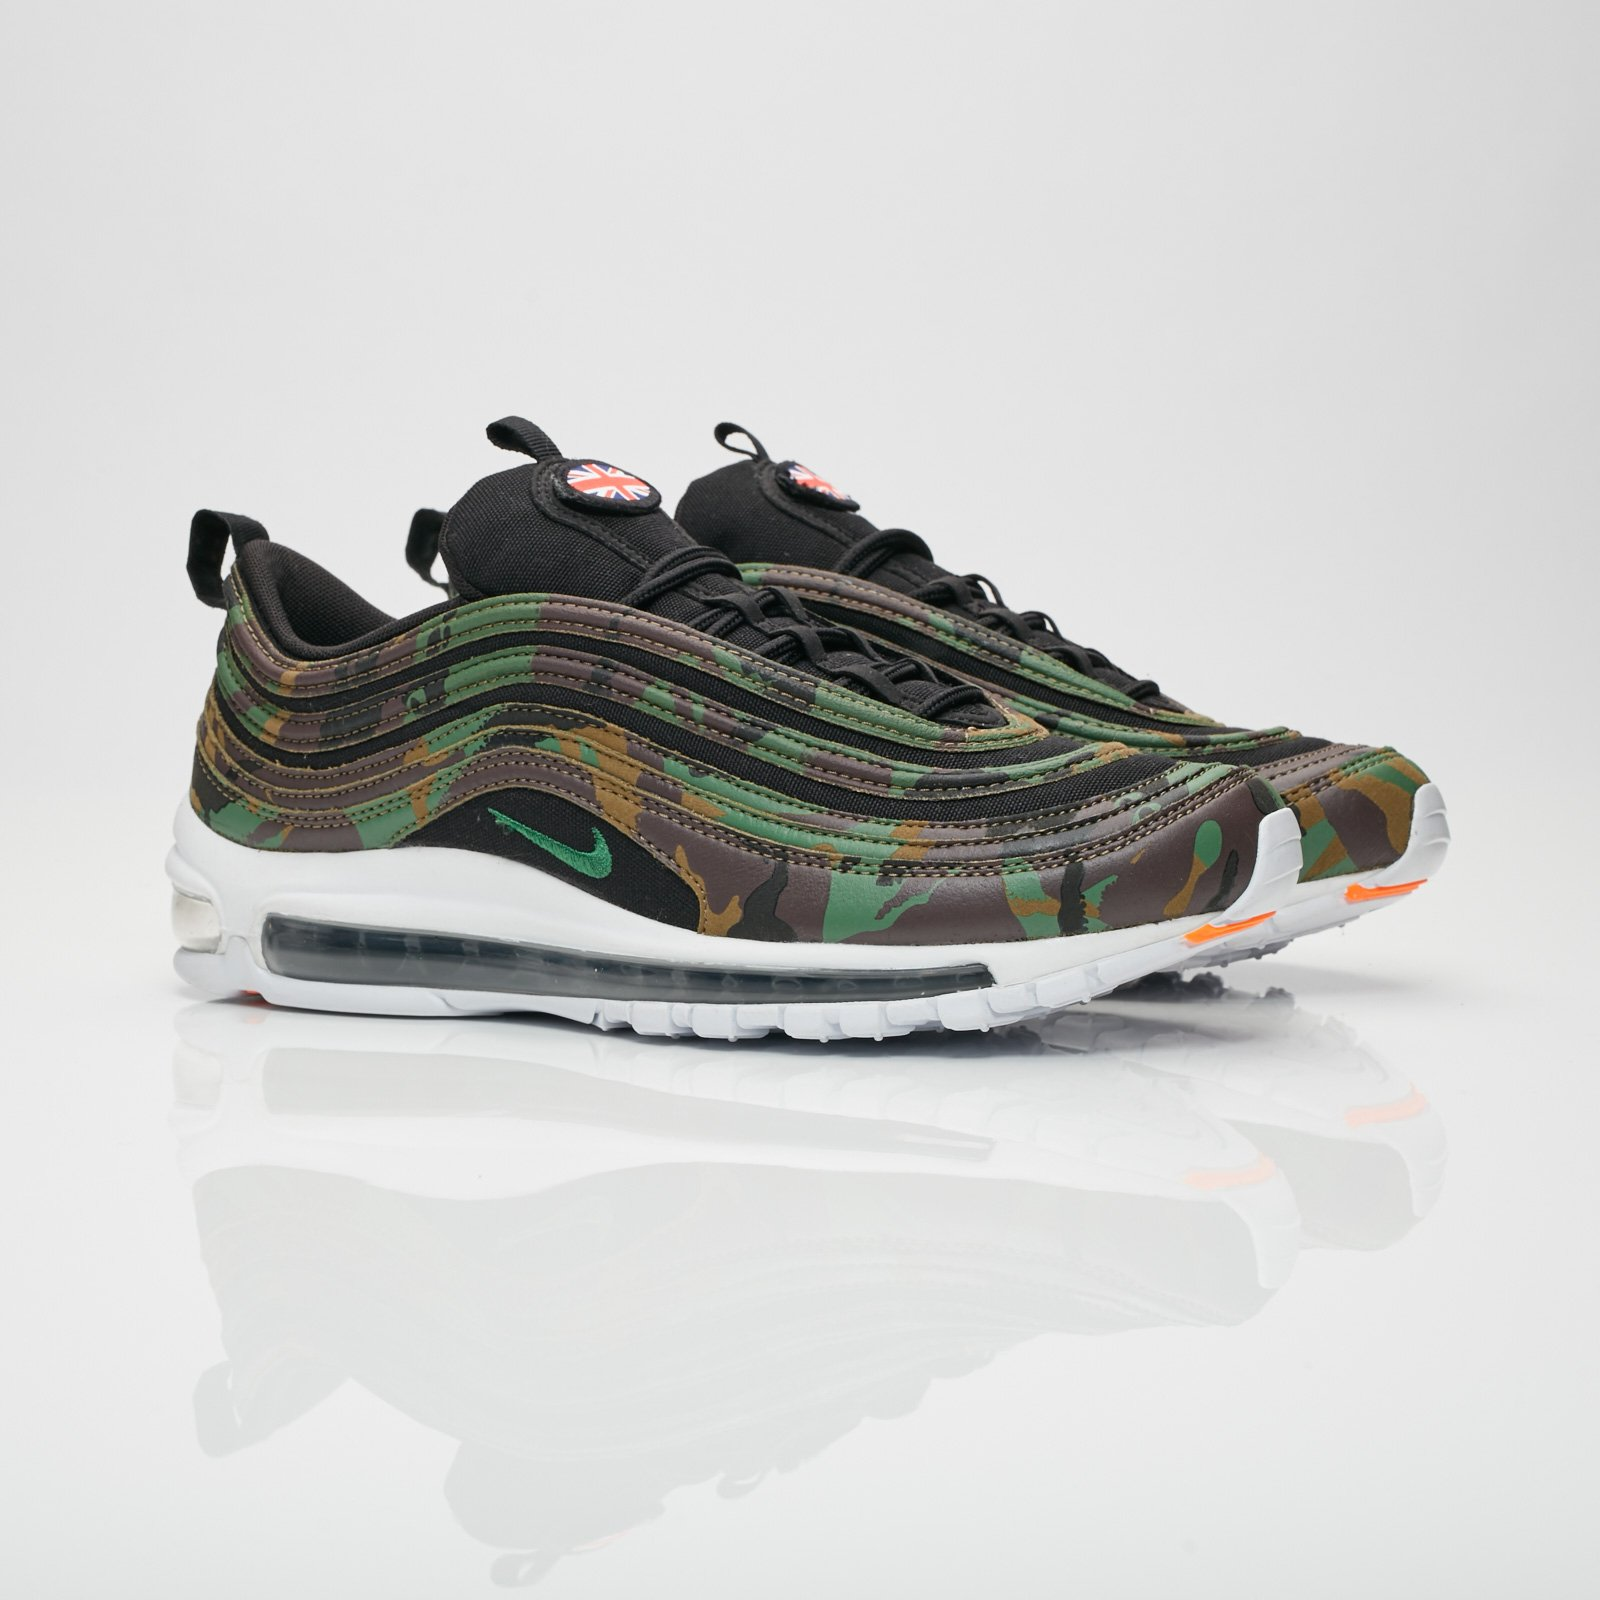 921354c3f356 Nike Air Max 97 Premium QS